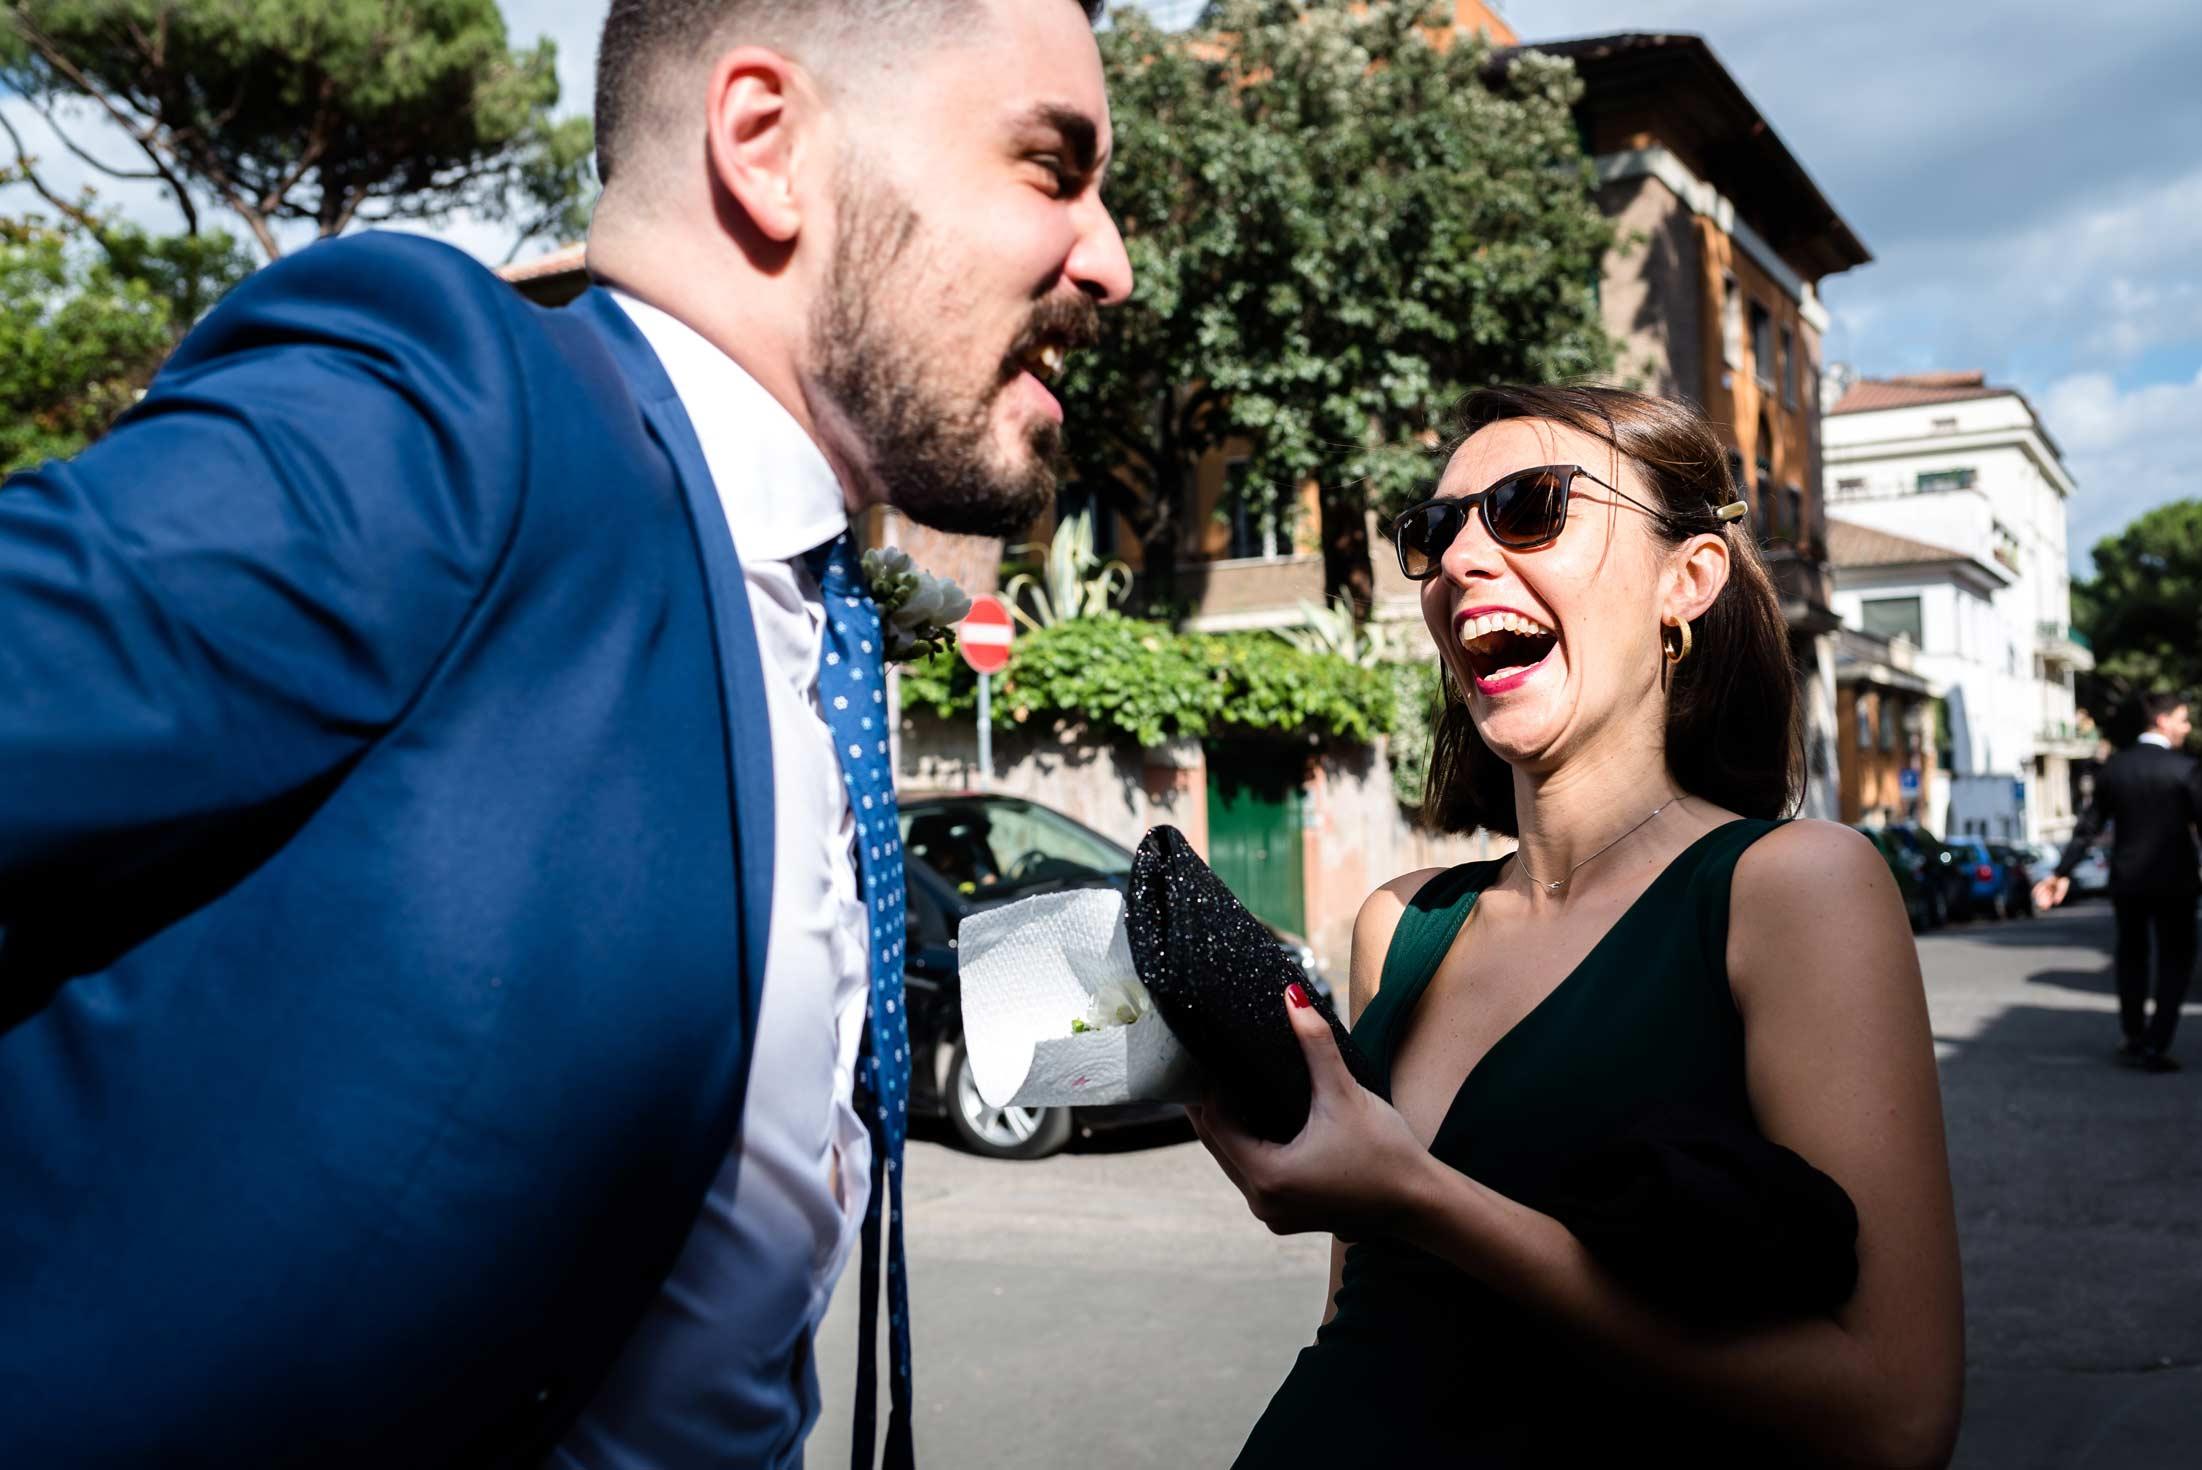 Reportage-Wedding-Photography-2-Ceremony